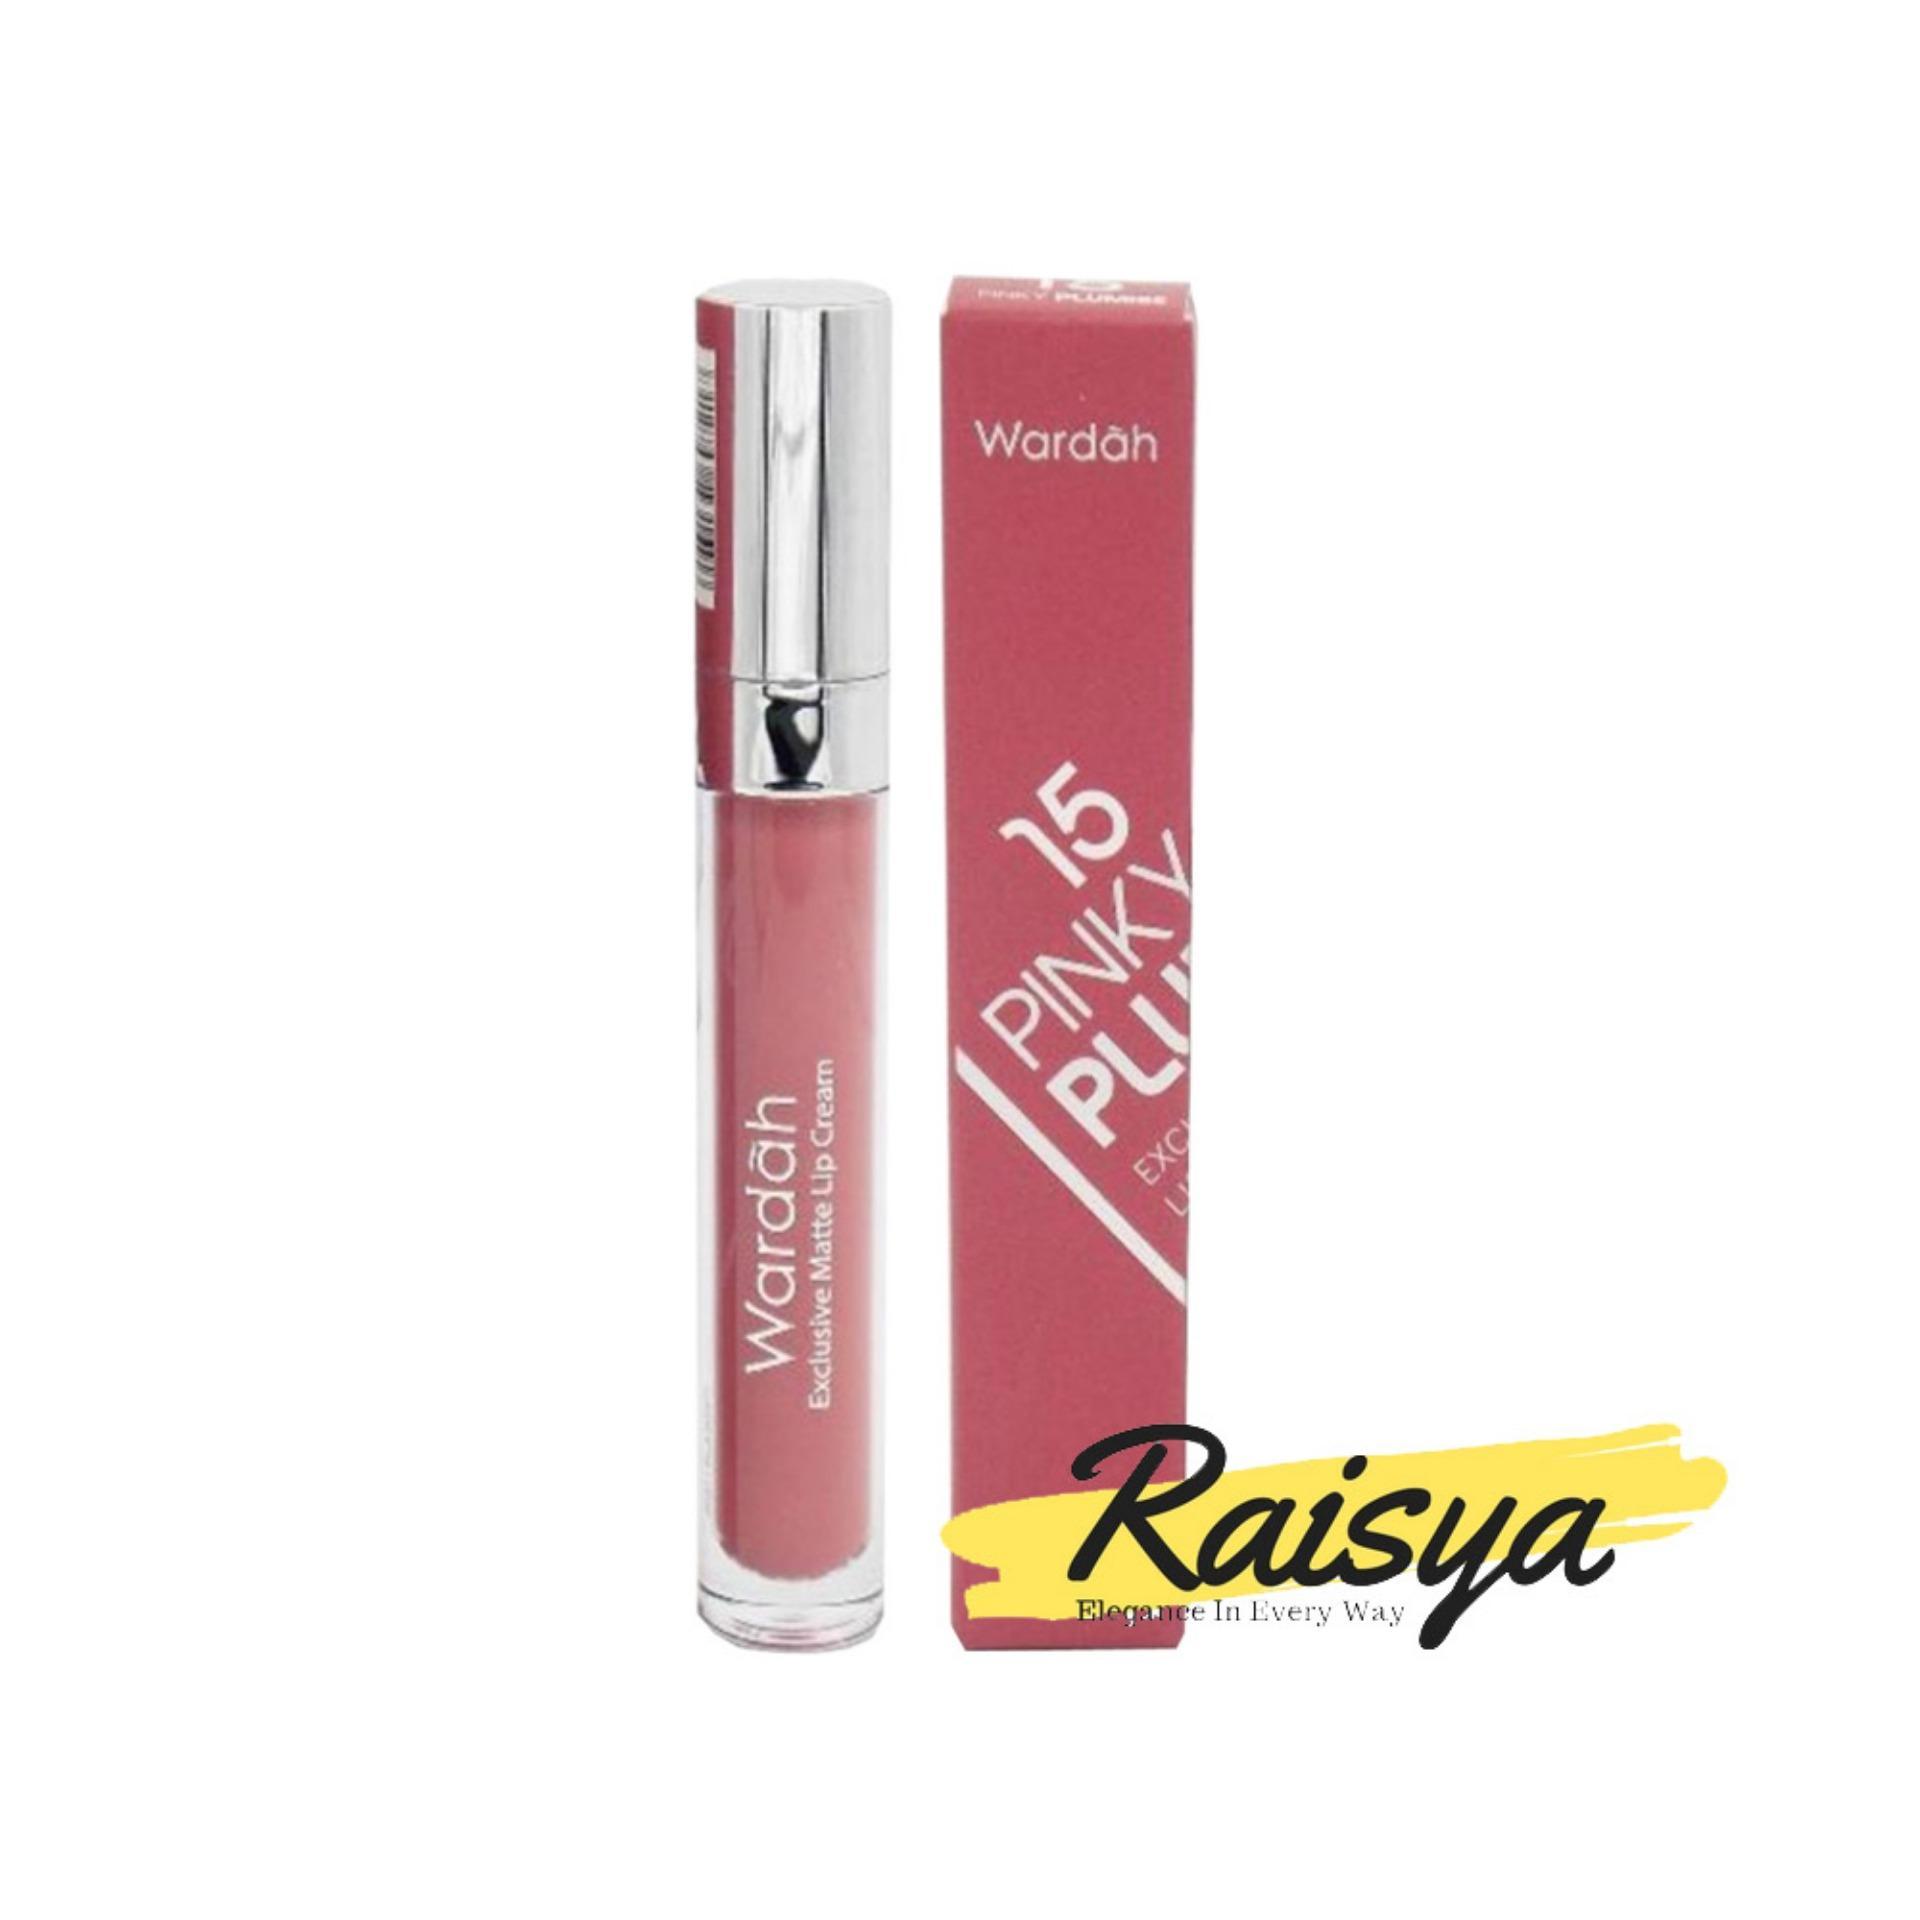 Cek Harga Baru Wardah Exclusive Matte Lip Cream No 06 Feeling Red Mate 15 Pinky Plumise Original